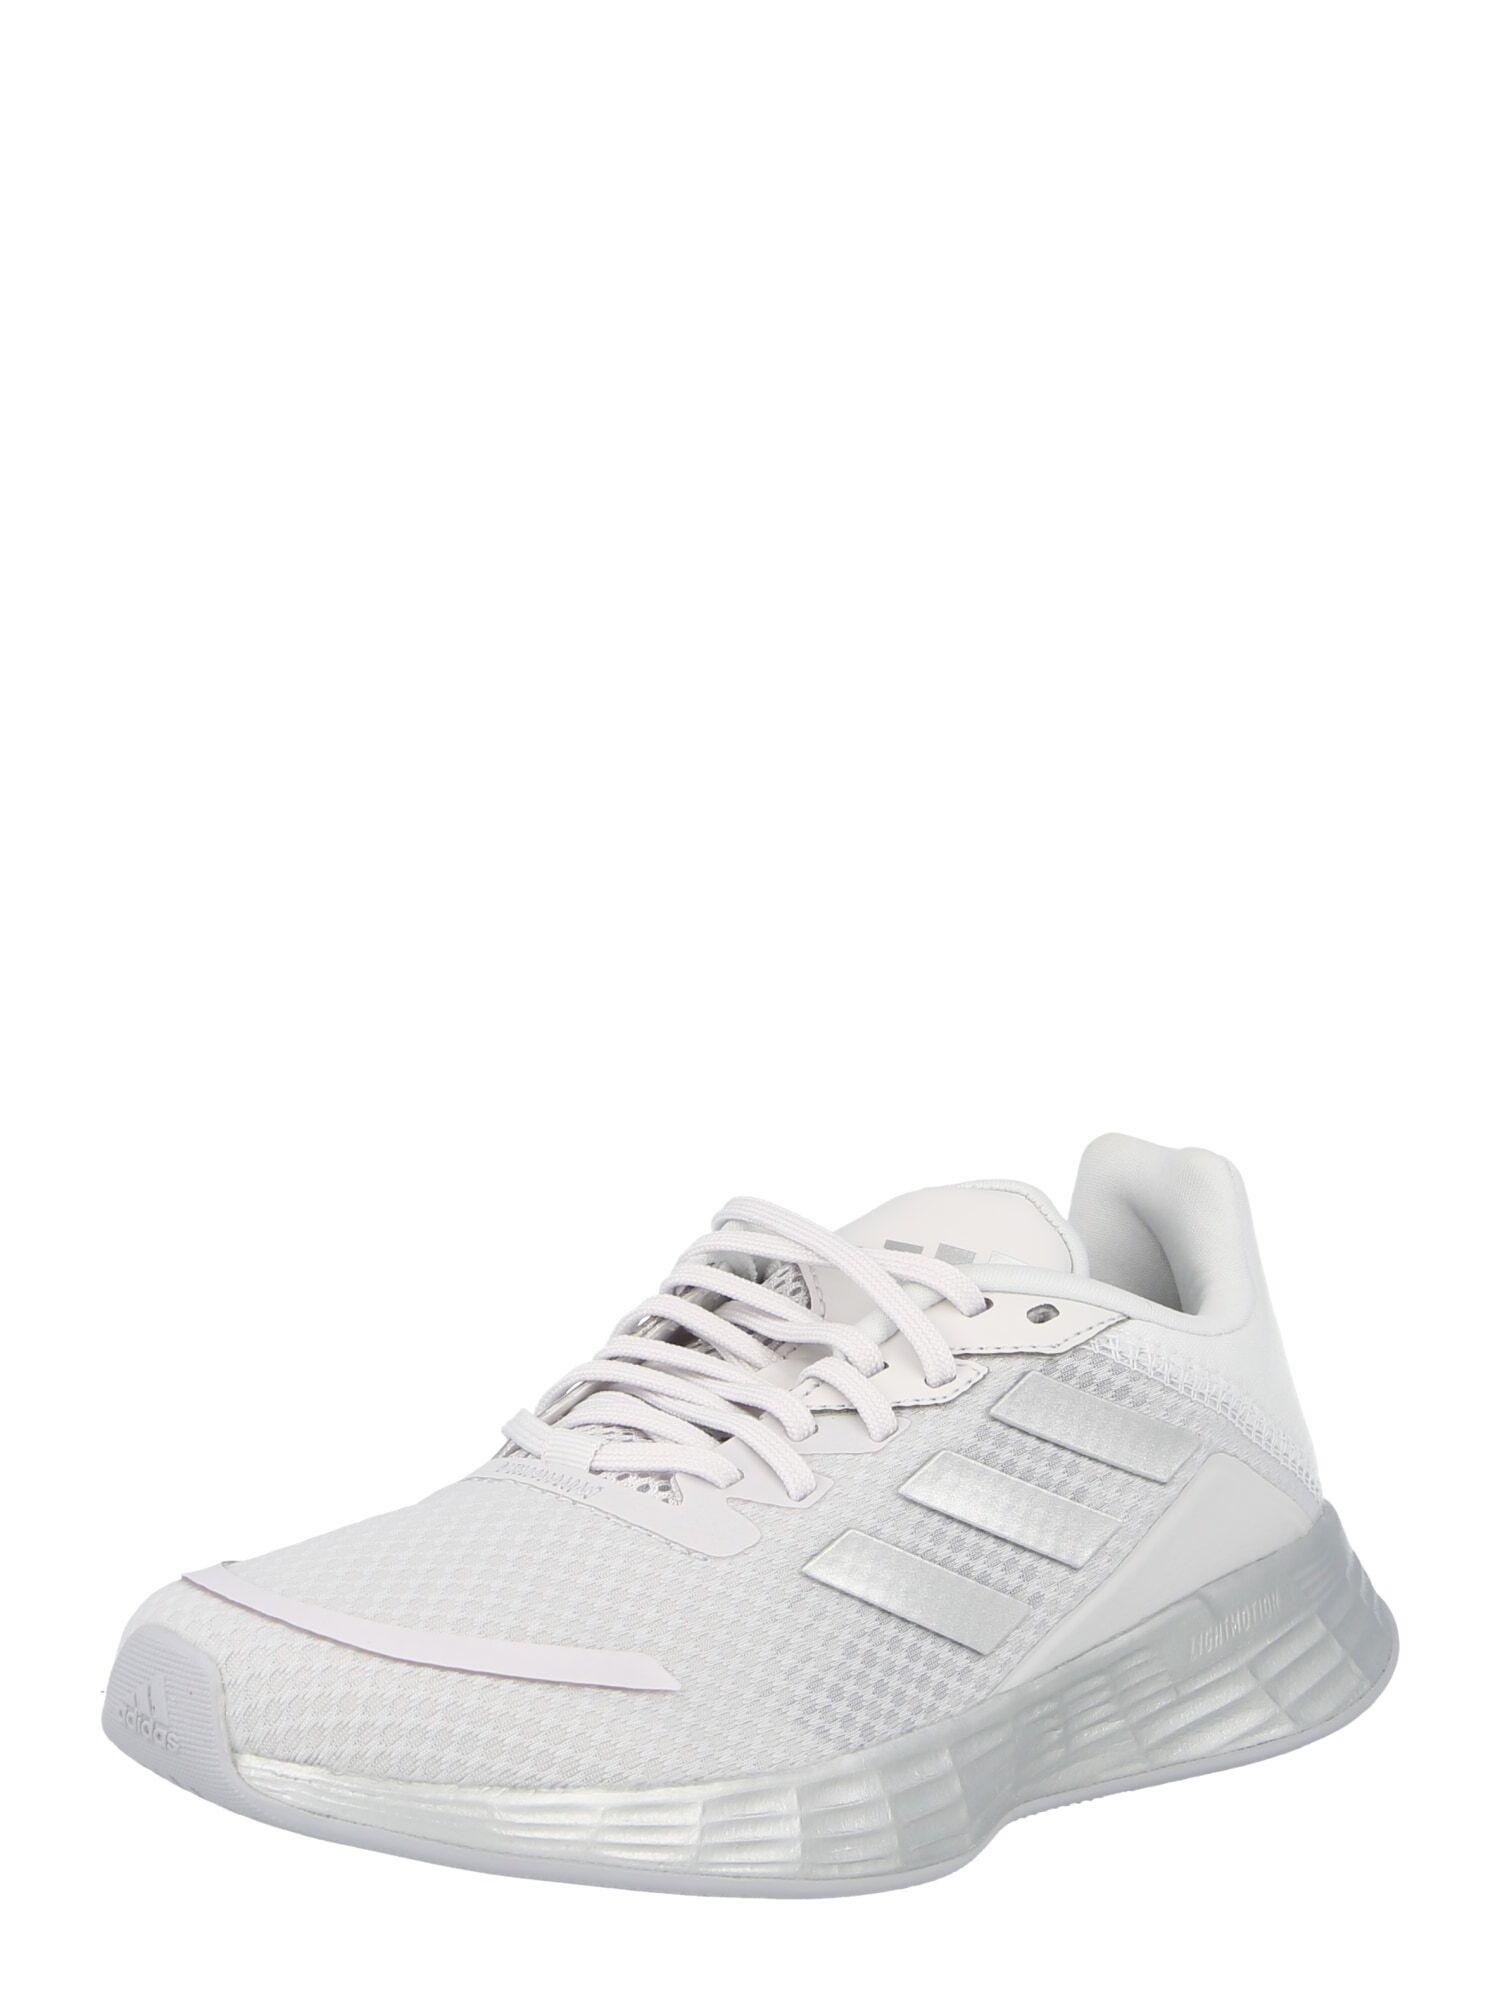 ADIDAS PERFORMANCE Chaussure de course 'Duramo'  - Blanc - Taille: 7 - female